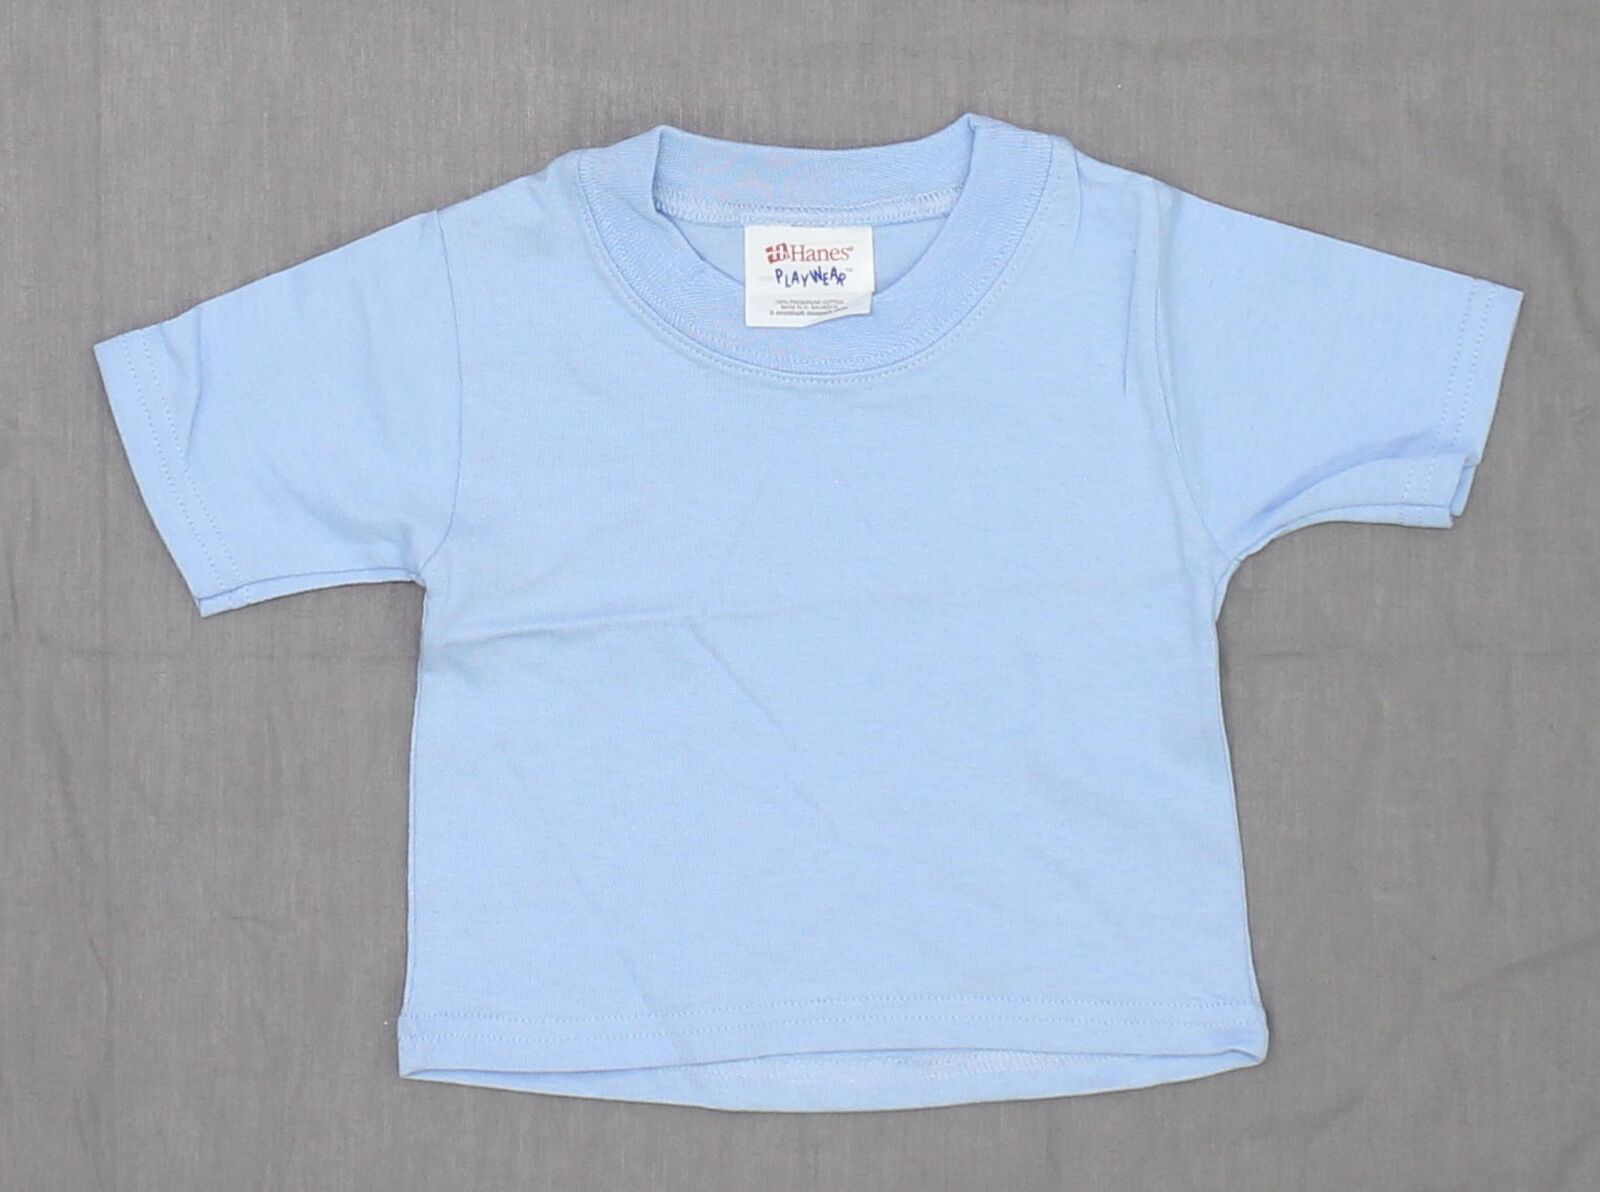 nEW Hanes Playwear Infant Baby Short-Sleeve T-Shirt Light Blue 6 Months